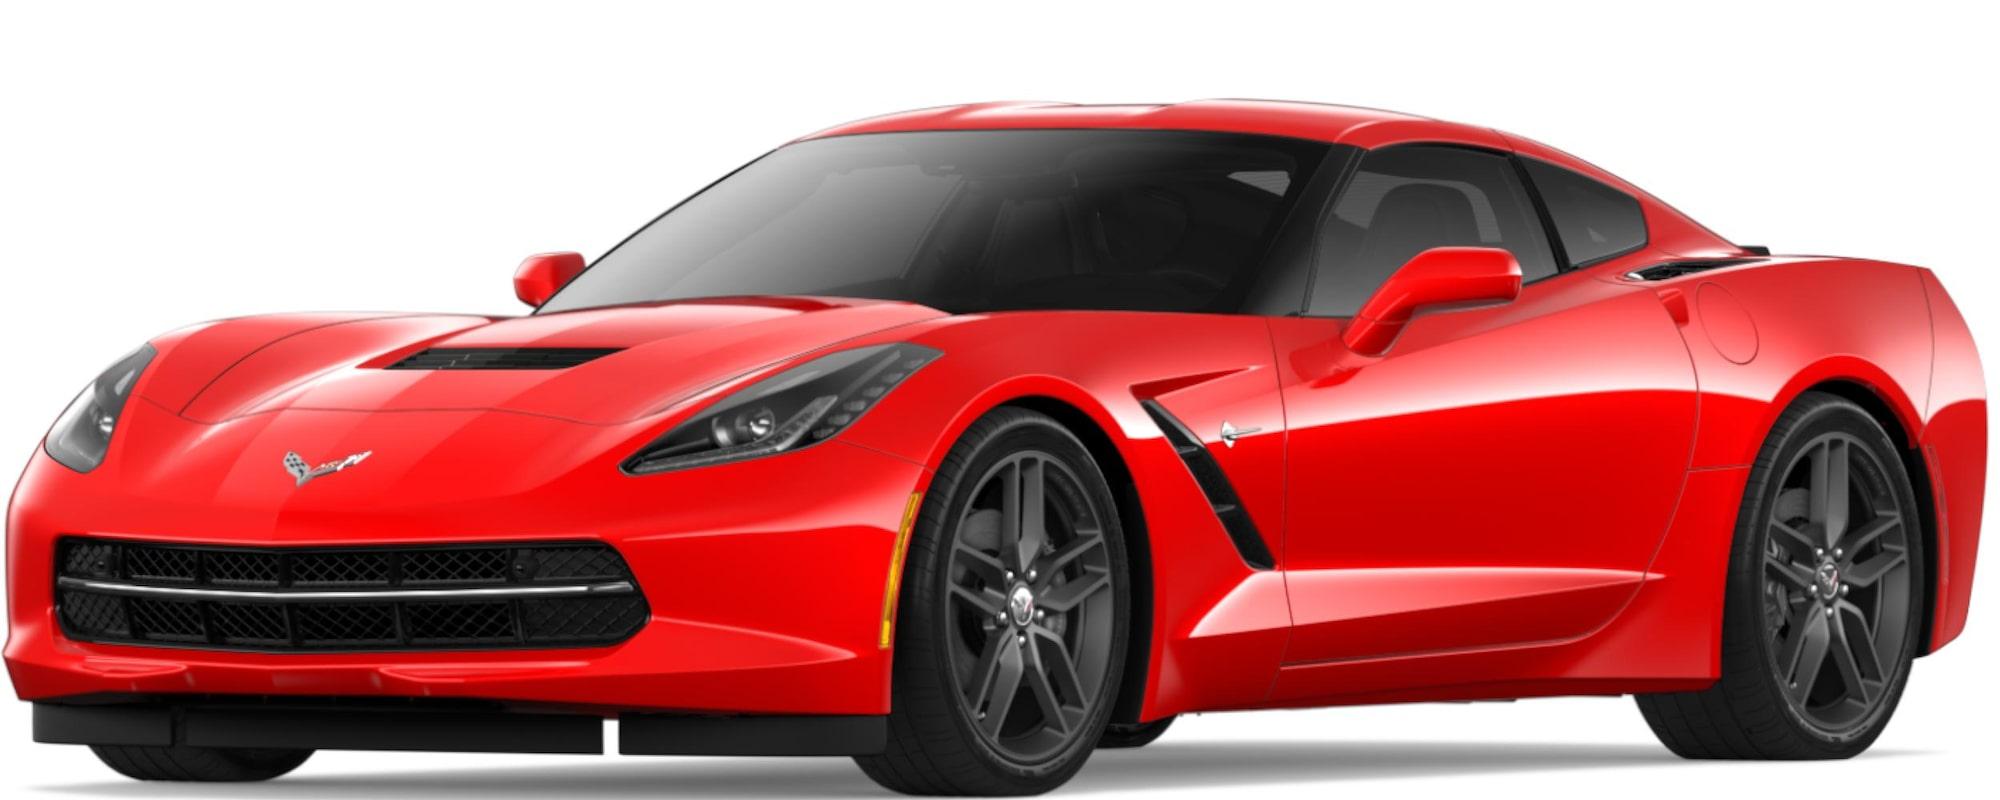 2018 Chevrolet Sonic Price >> 2018 Chevrolet Corvette for sale near Sacramento | John L Sullivan Chevrolet